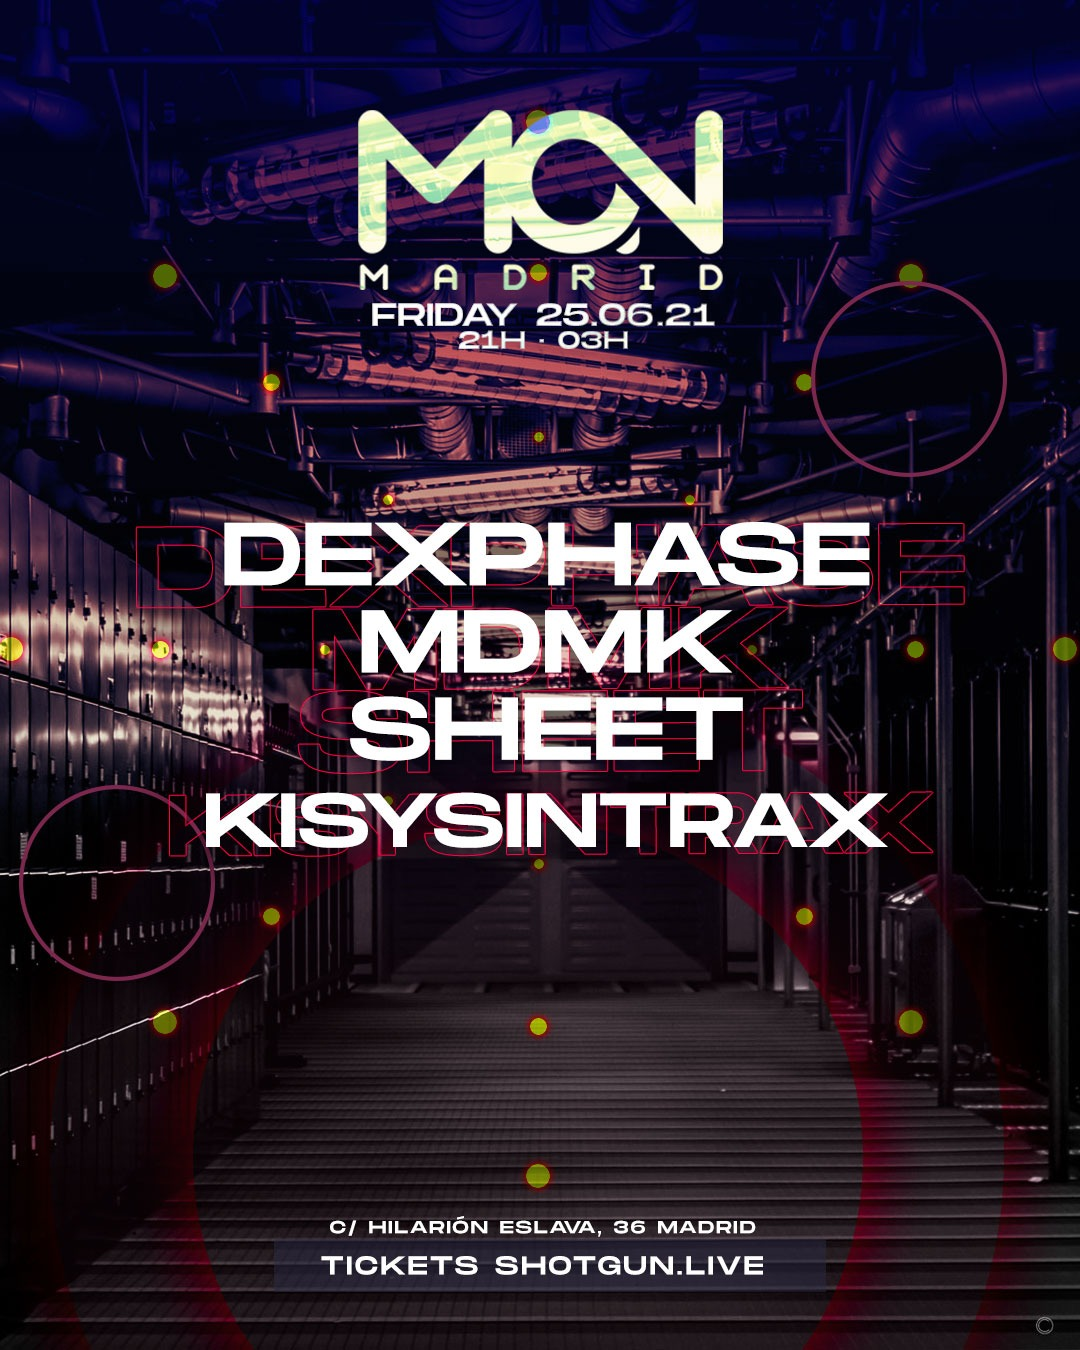 Dexphase, MDMK, Sheet & Kisysintrax @ Mon Club